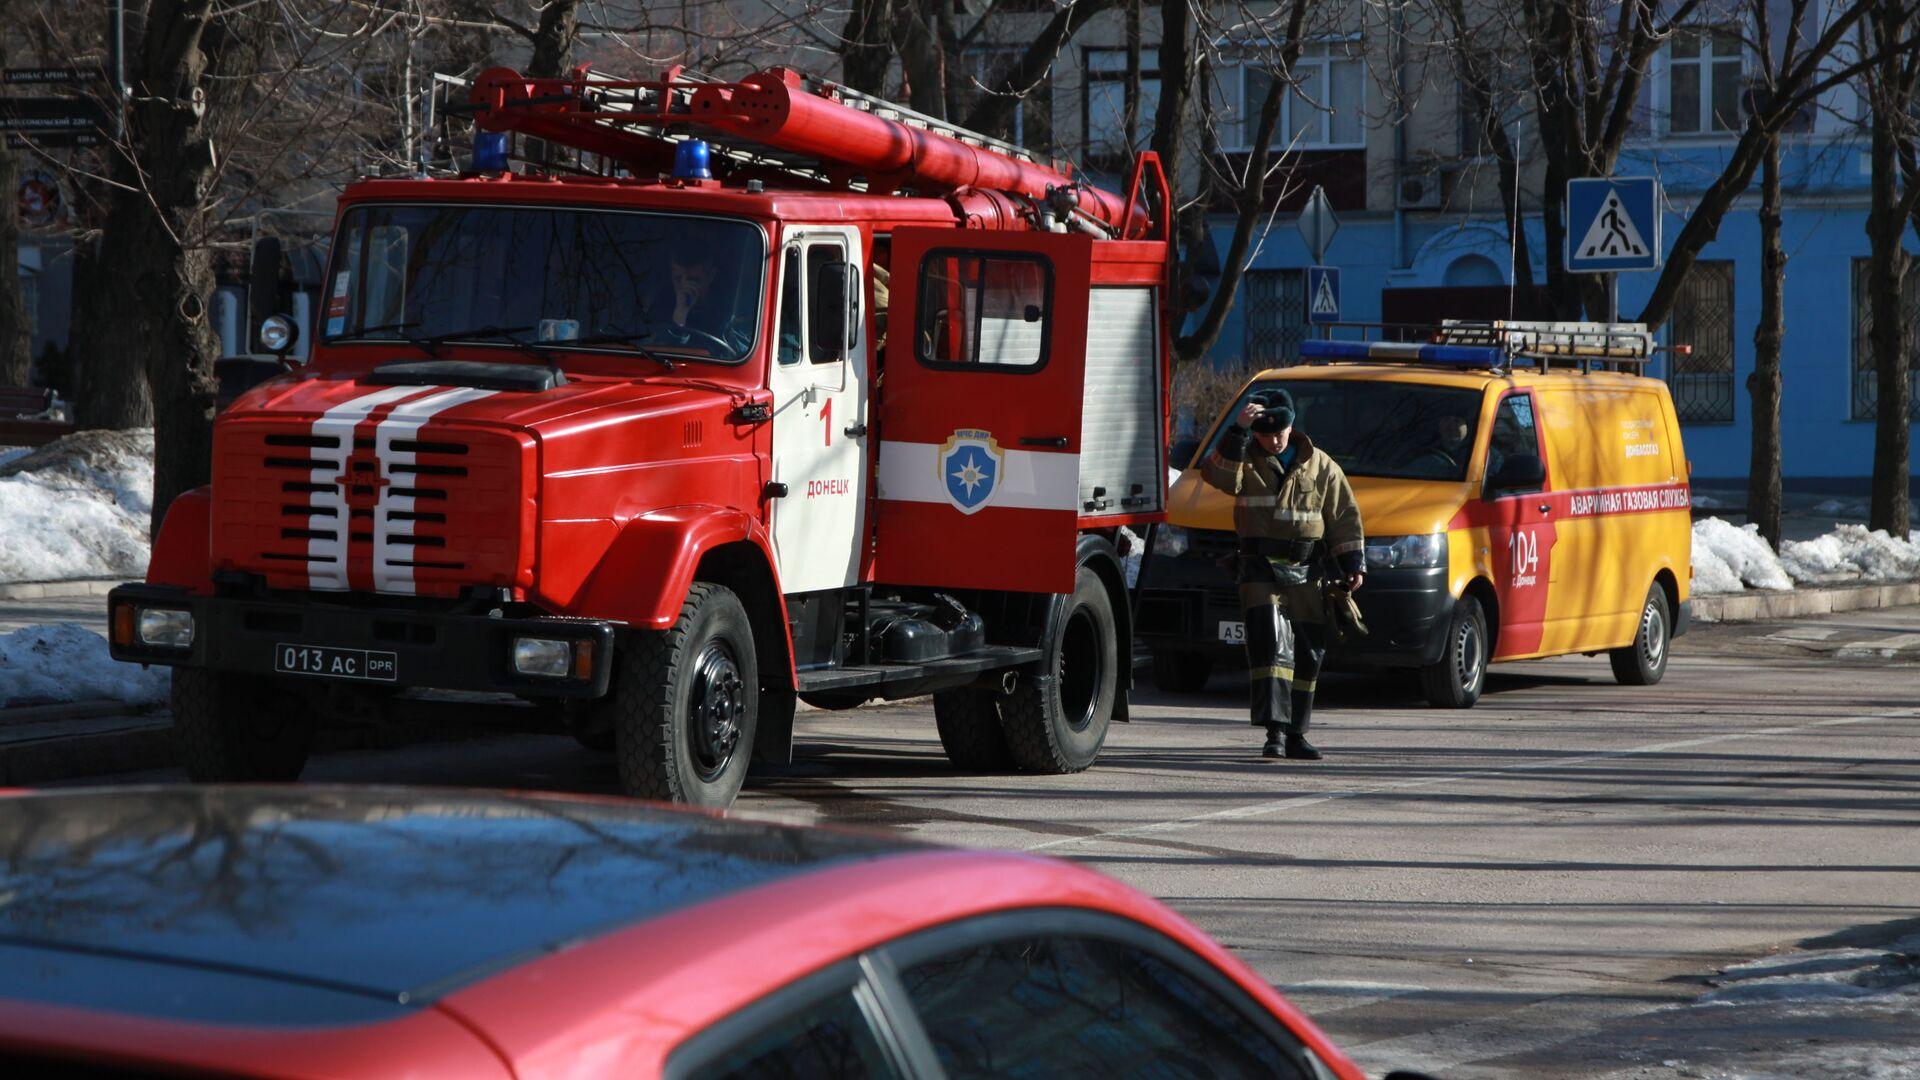 В центре Донецка прогремели три взрыва - РИА Новости, 1920, 02.12.2020